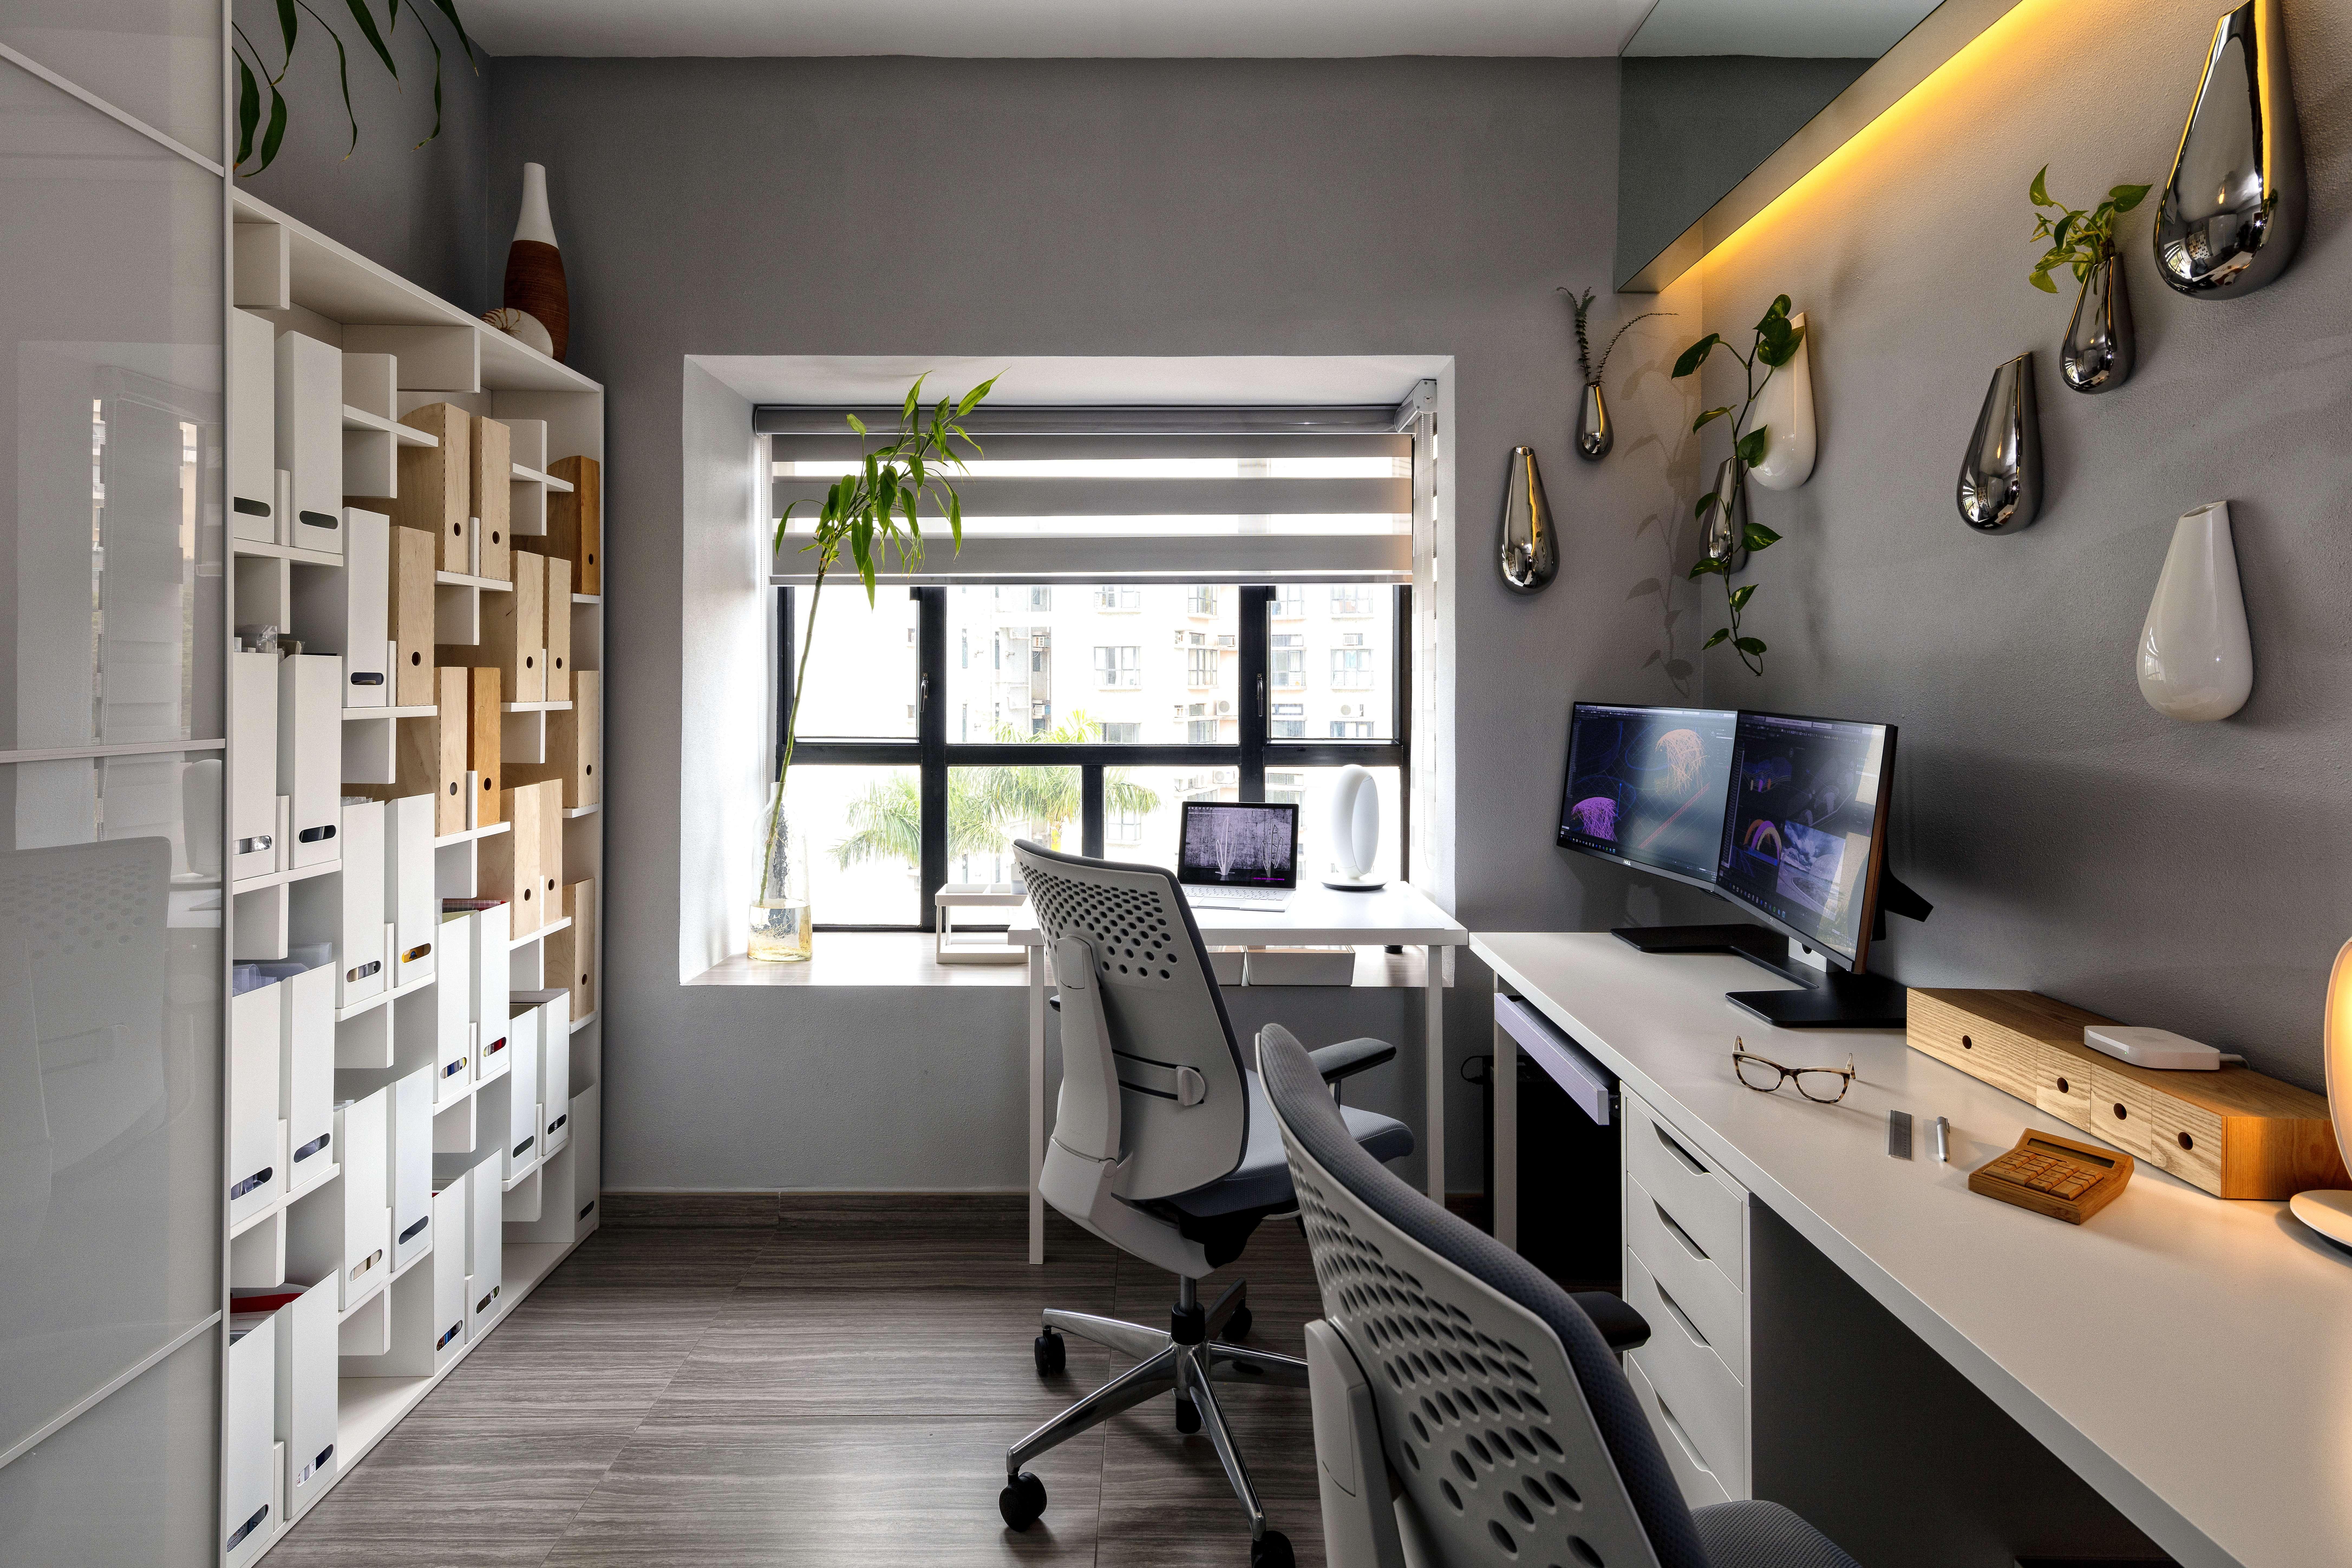 Architect Gives His Hong Kong Apartment Eco Friendly Makeover